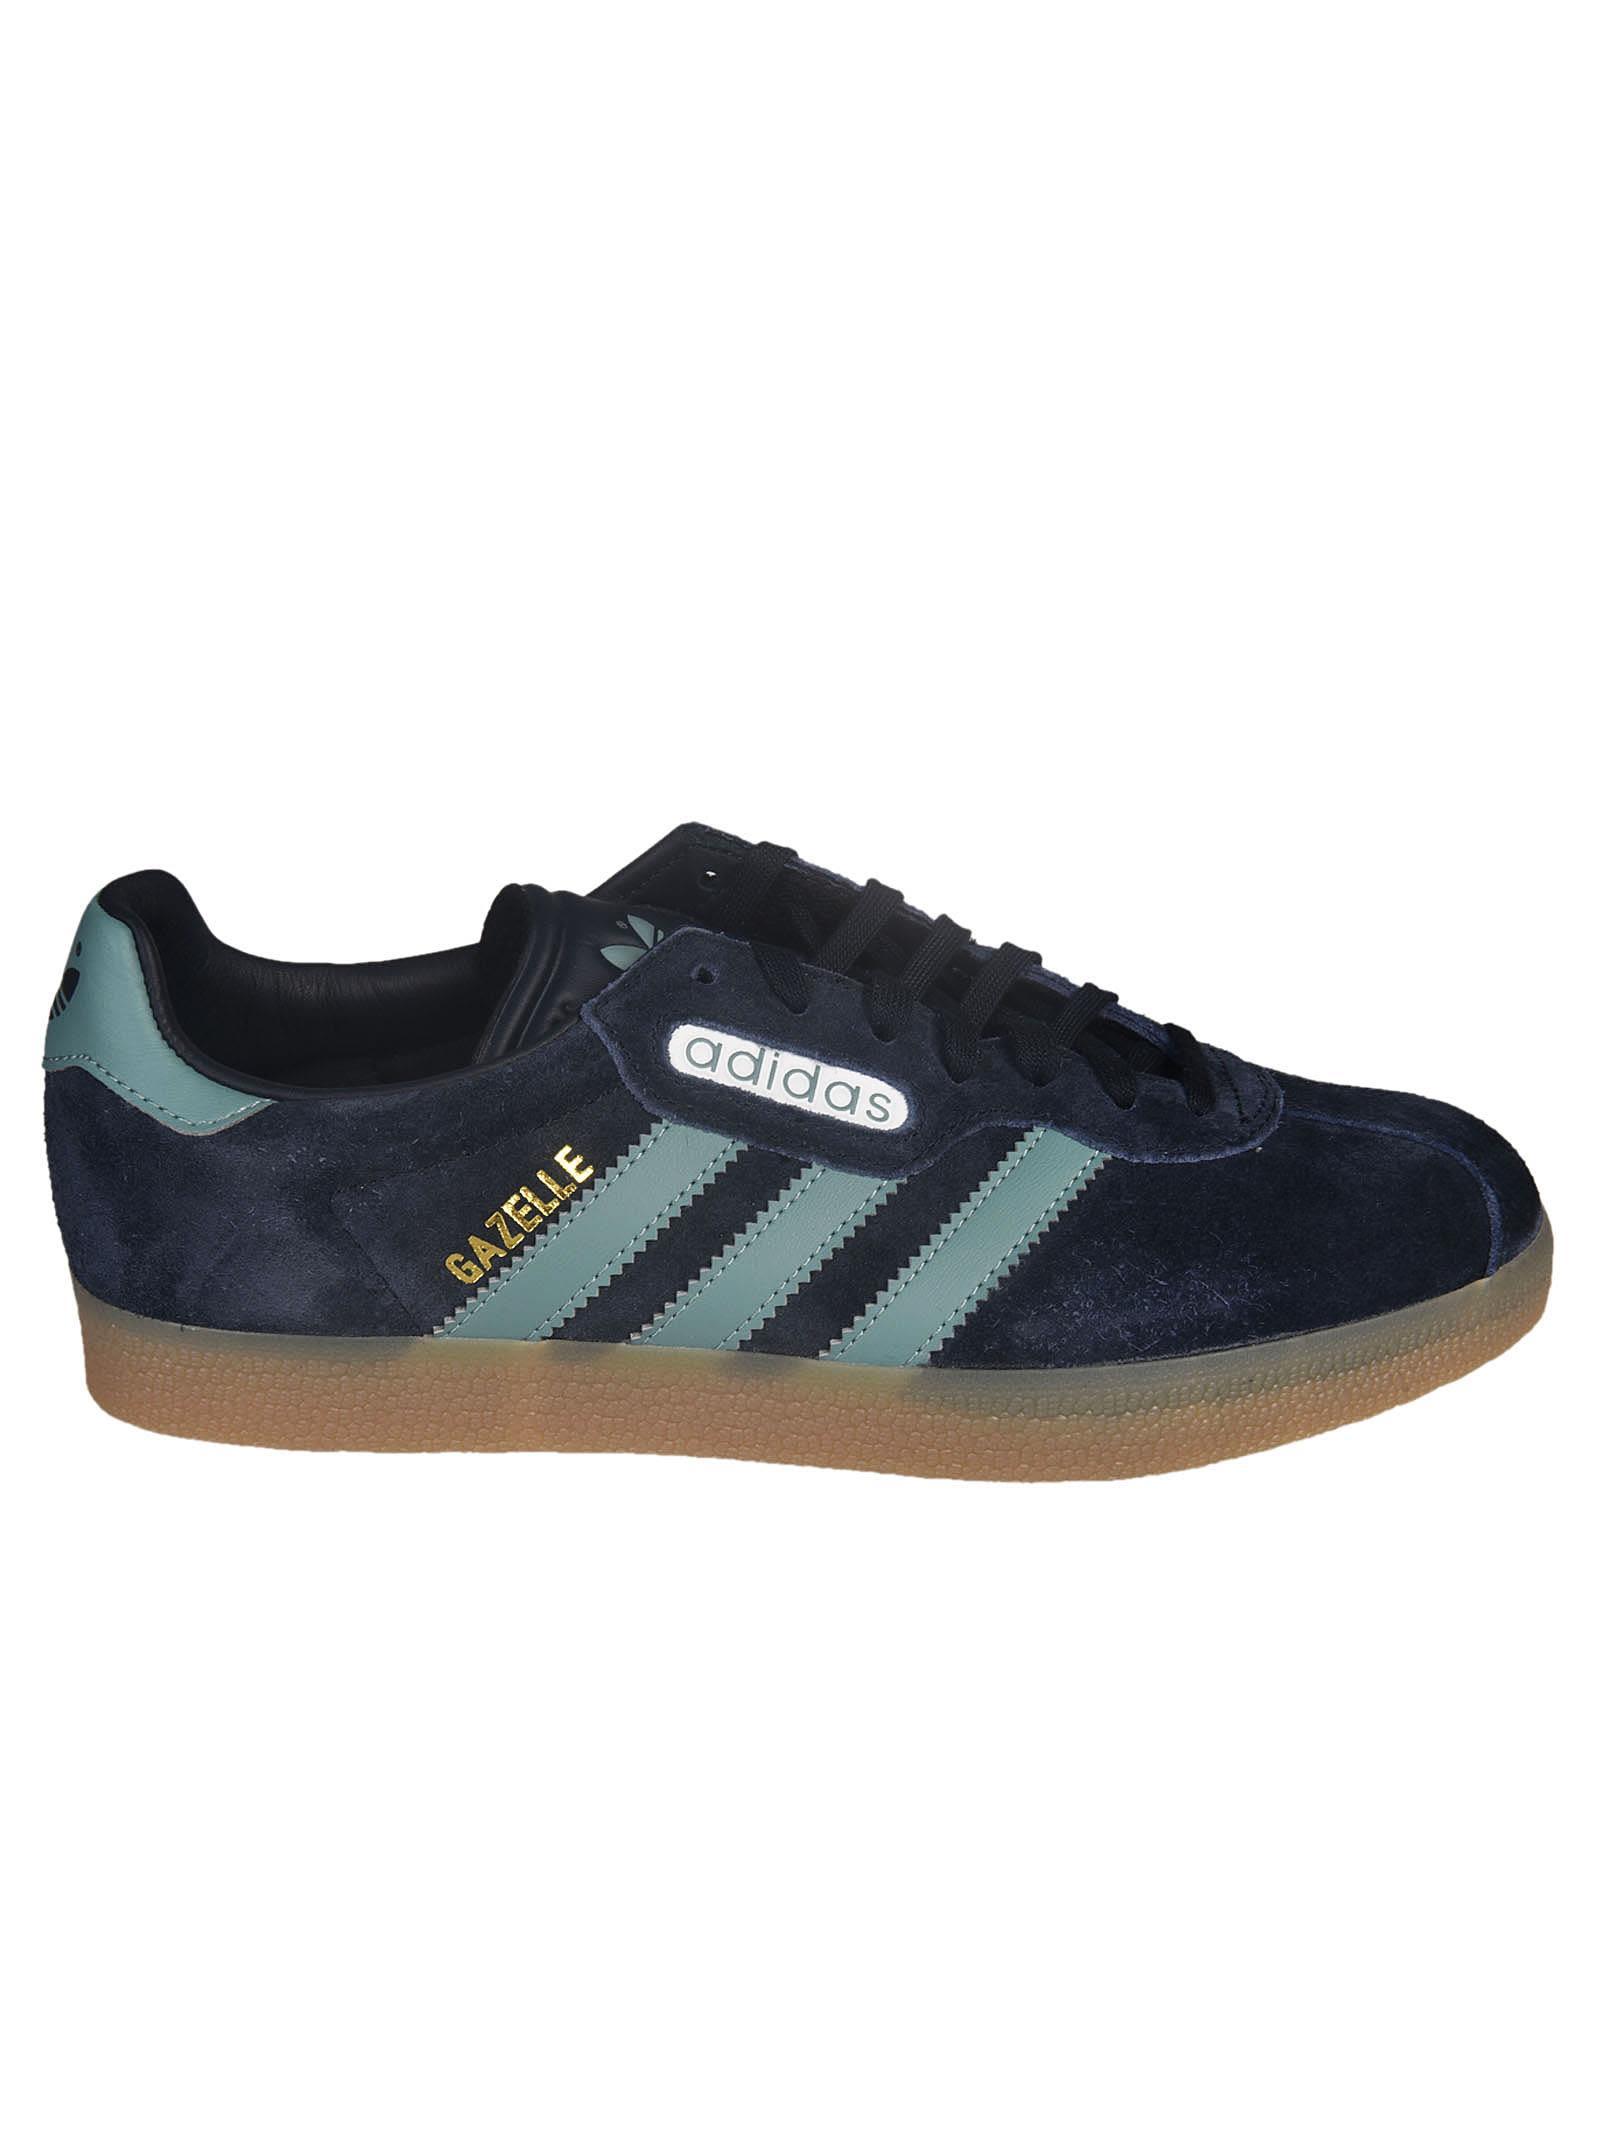 Adidas Gazelle Super Sneakers